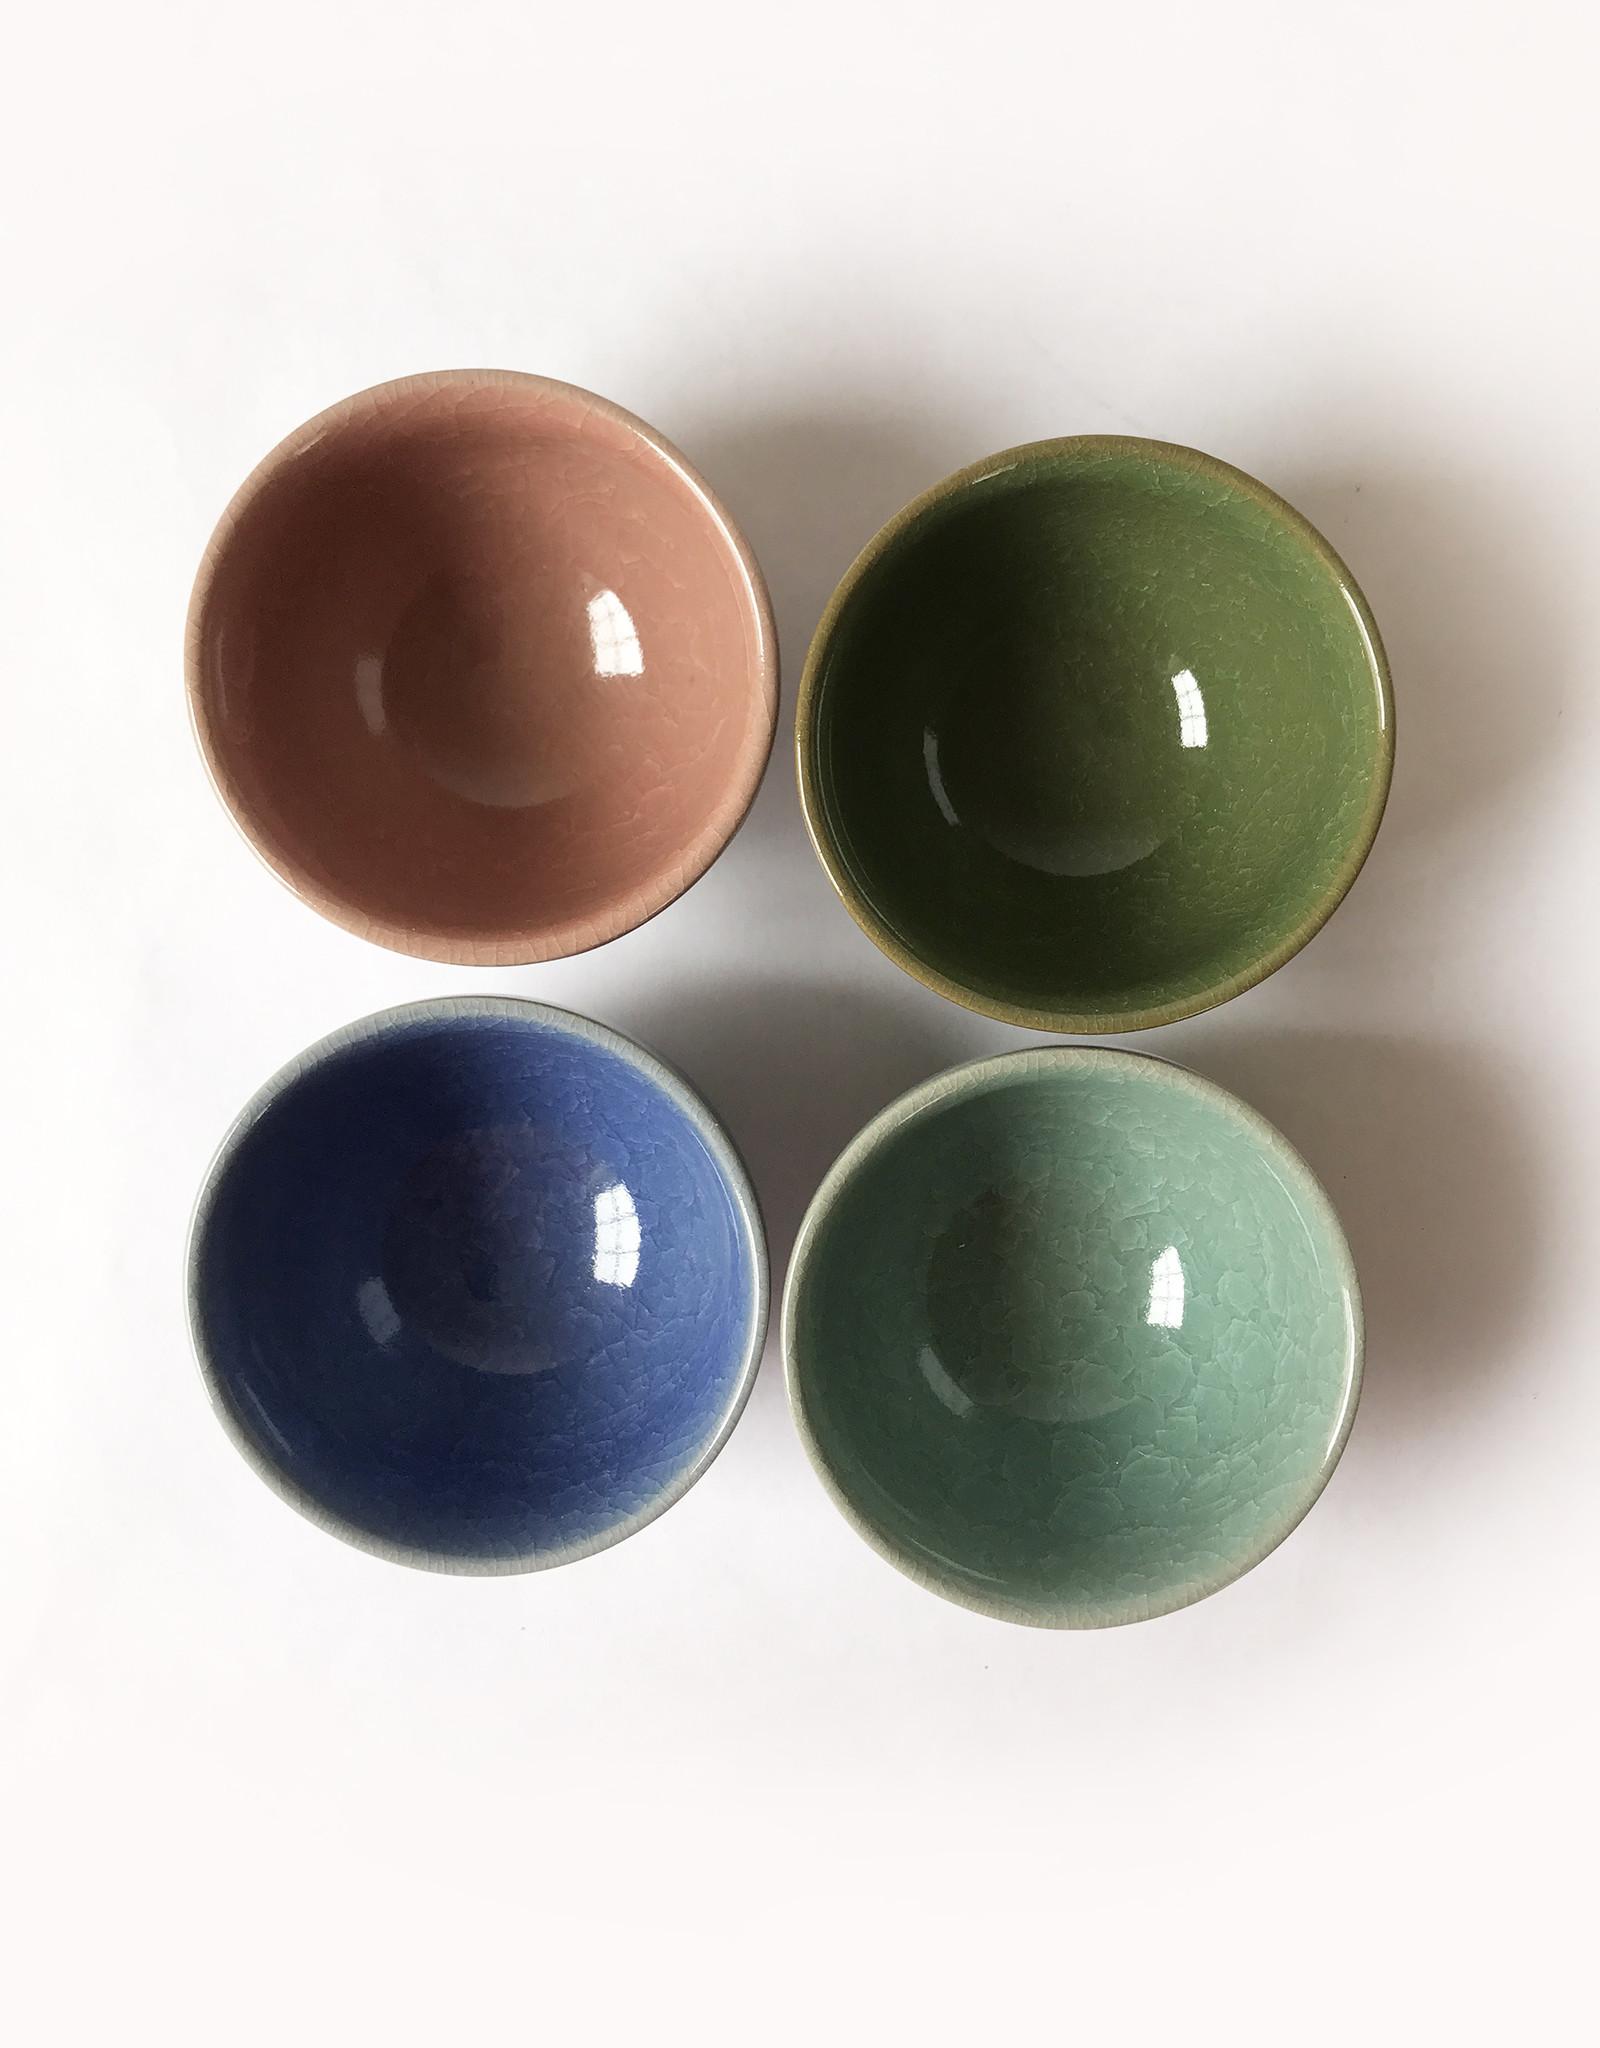 Miya Miya Crackle Tea Cup in Pastels, Set of 4